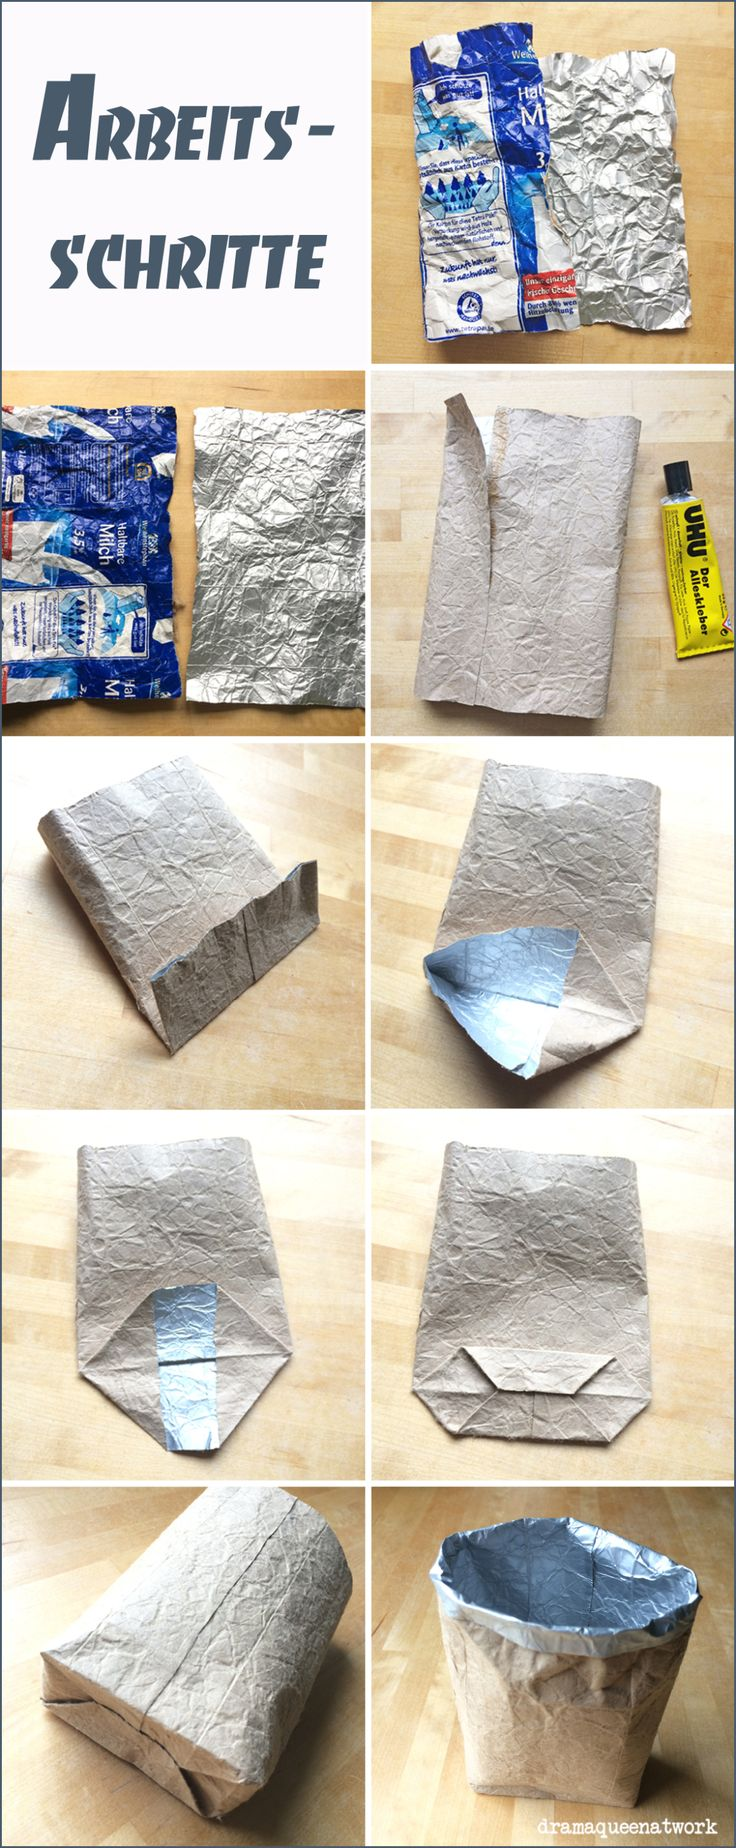 98 best milchkarton*tetrapack*milk carton images on pinterest